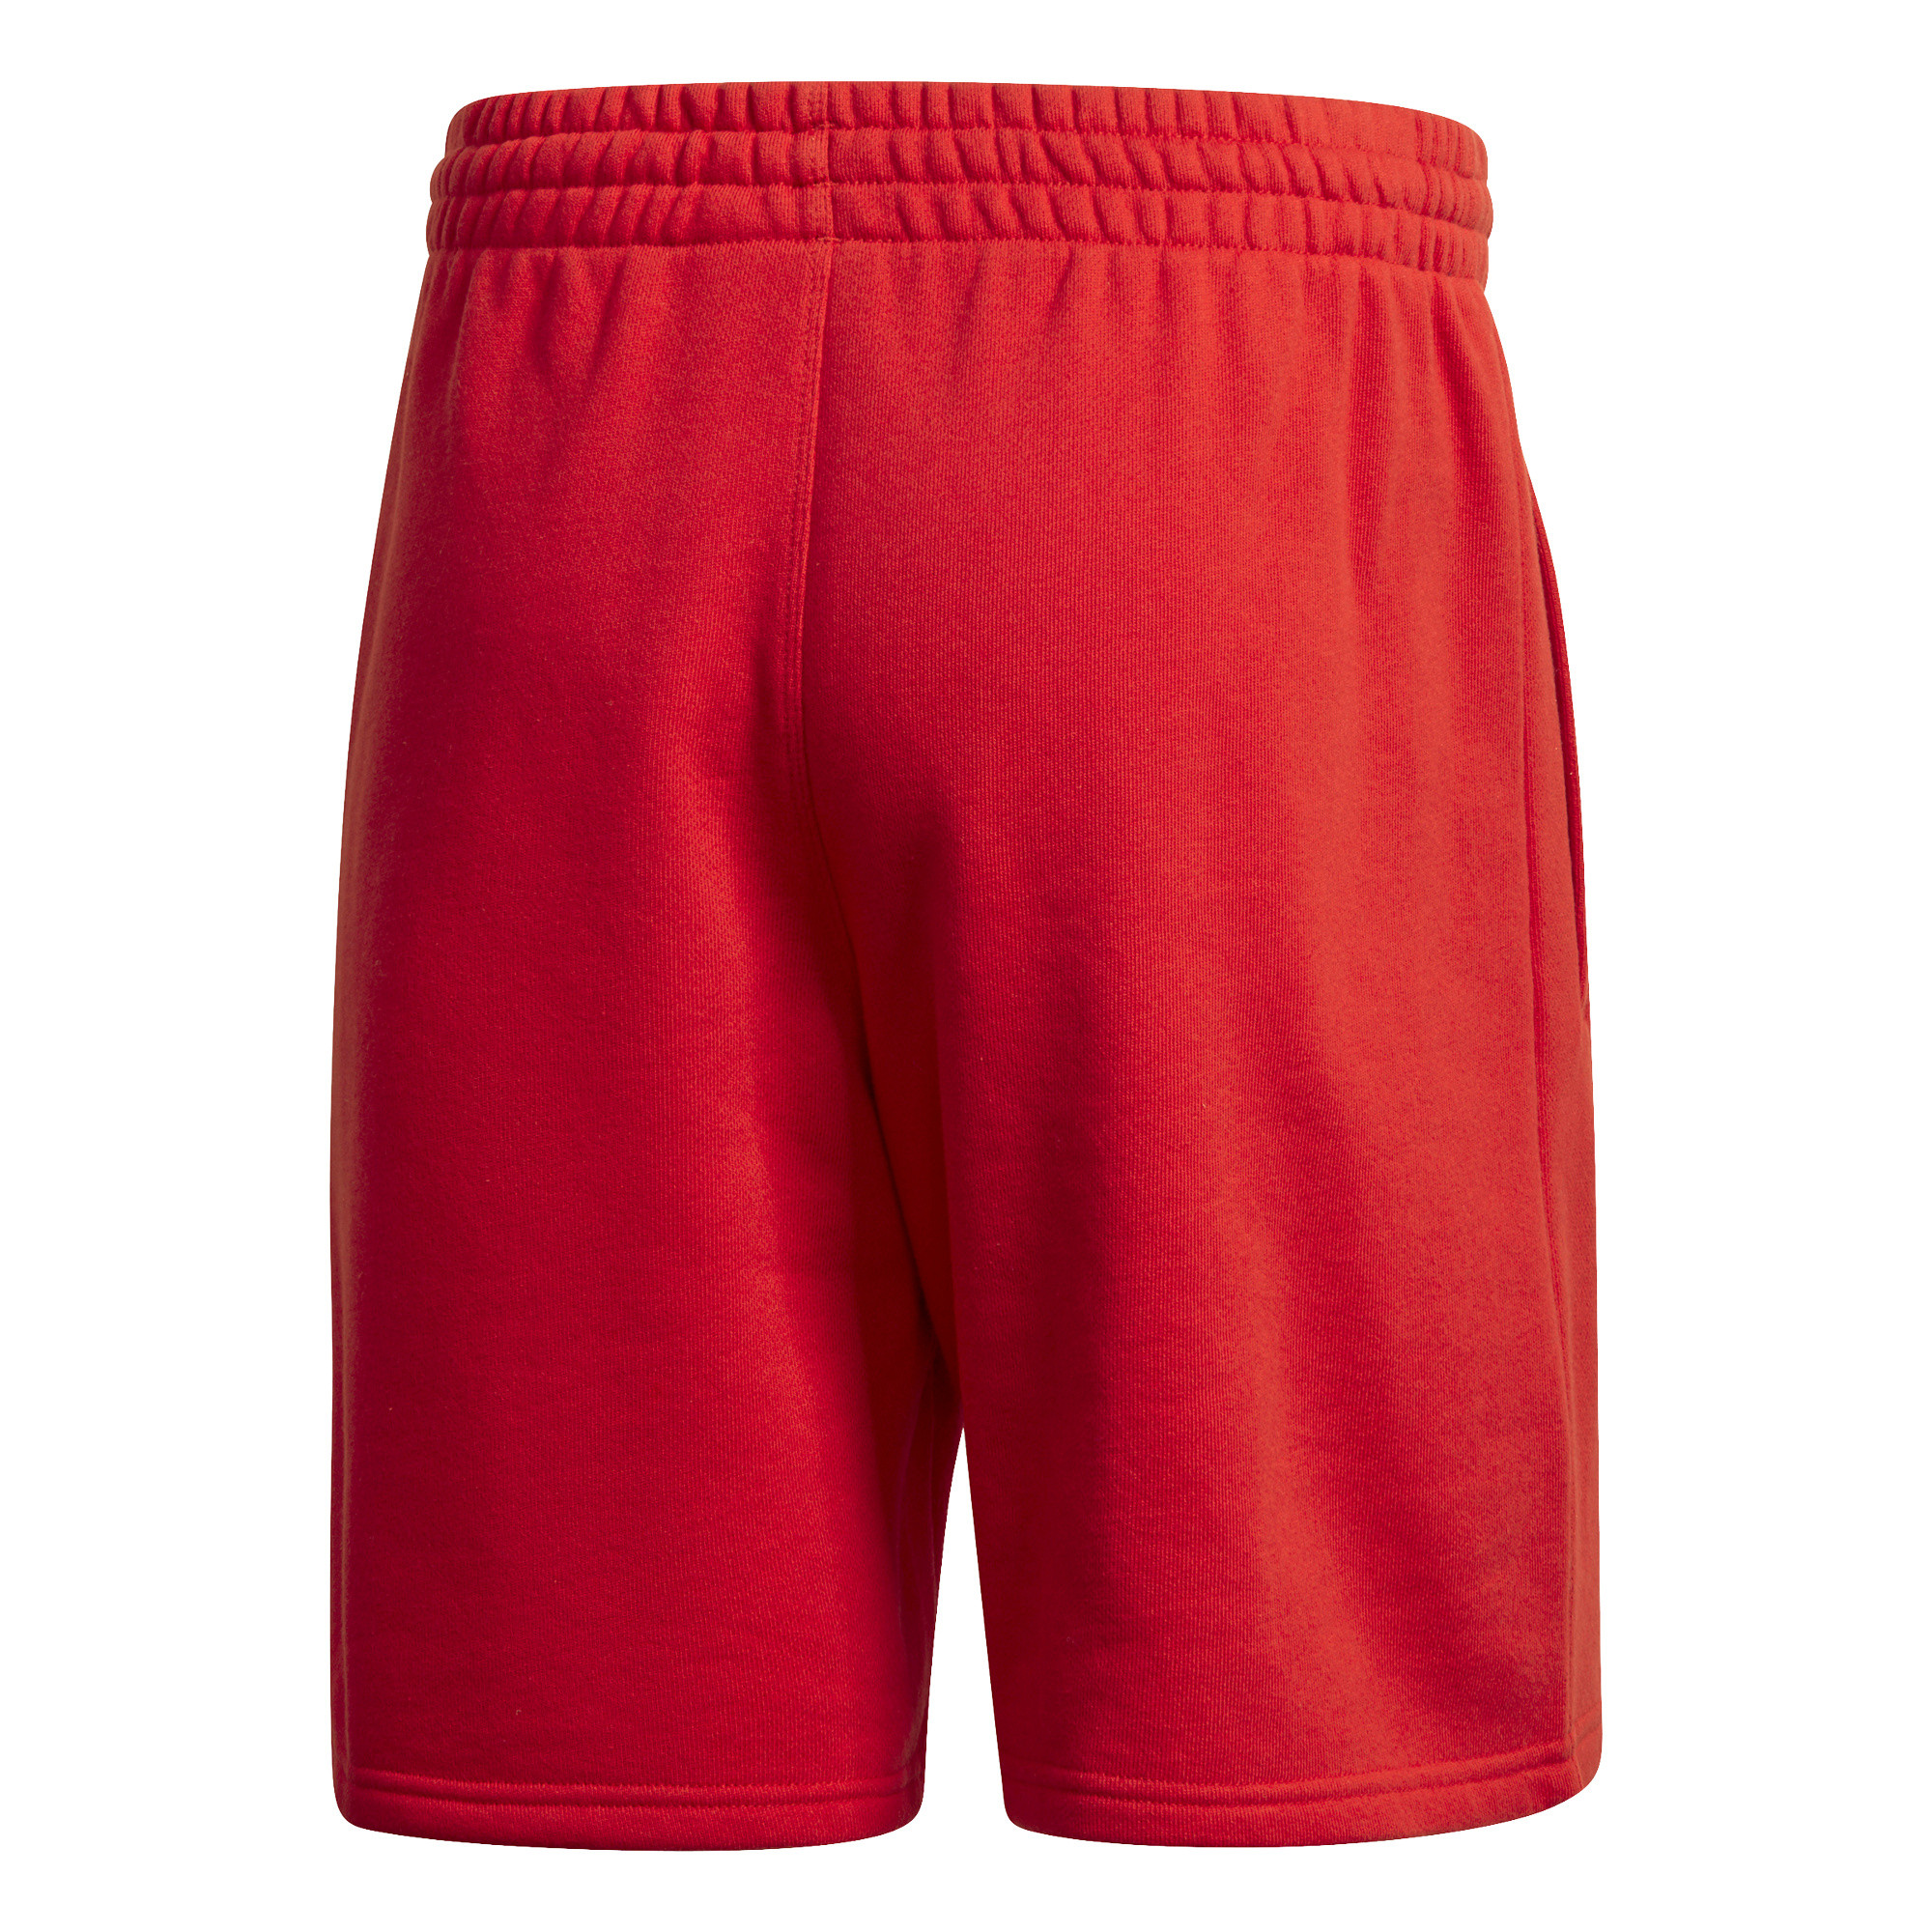 Short loungewear trefoil Essentials, Rosso, large image number 9